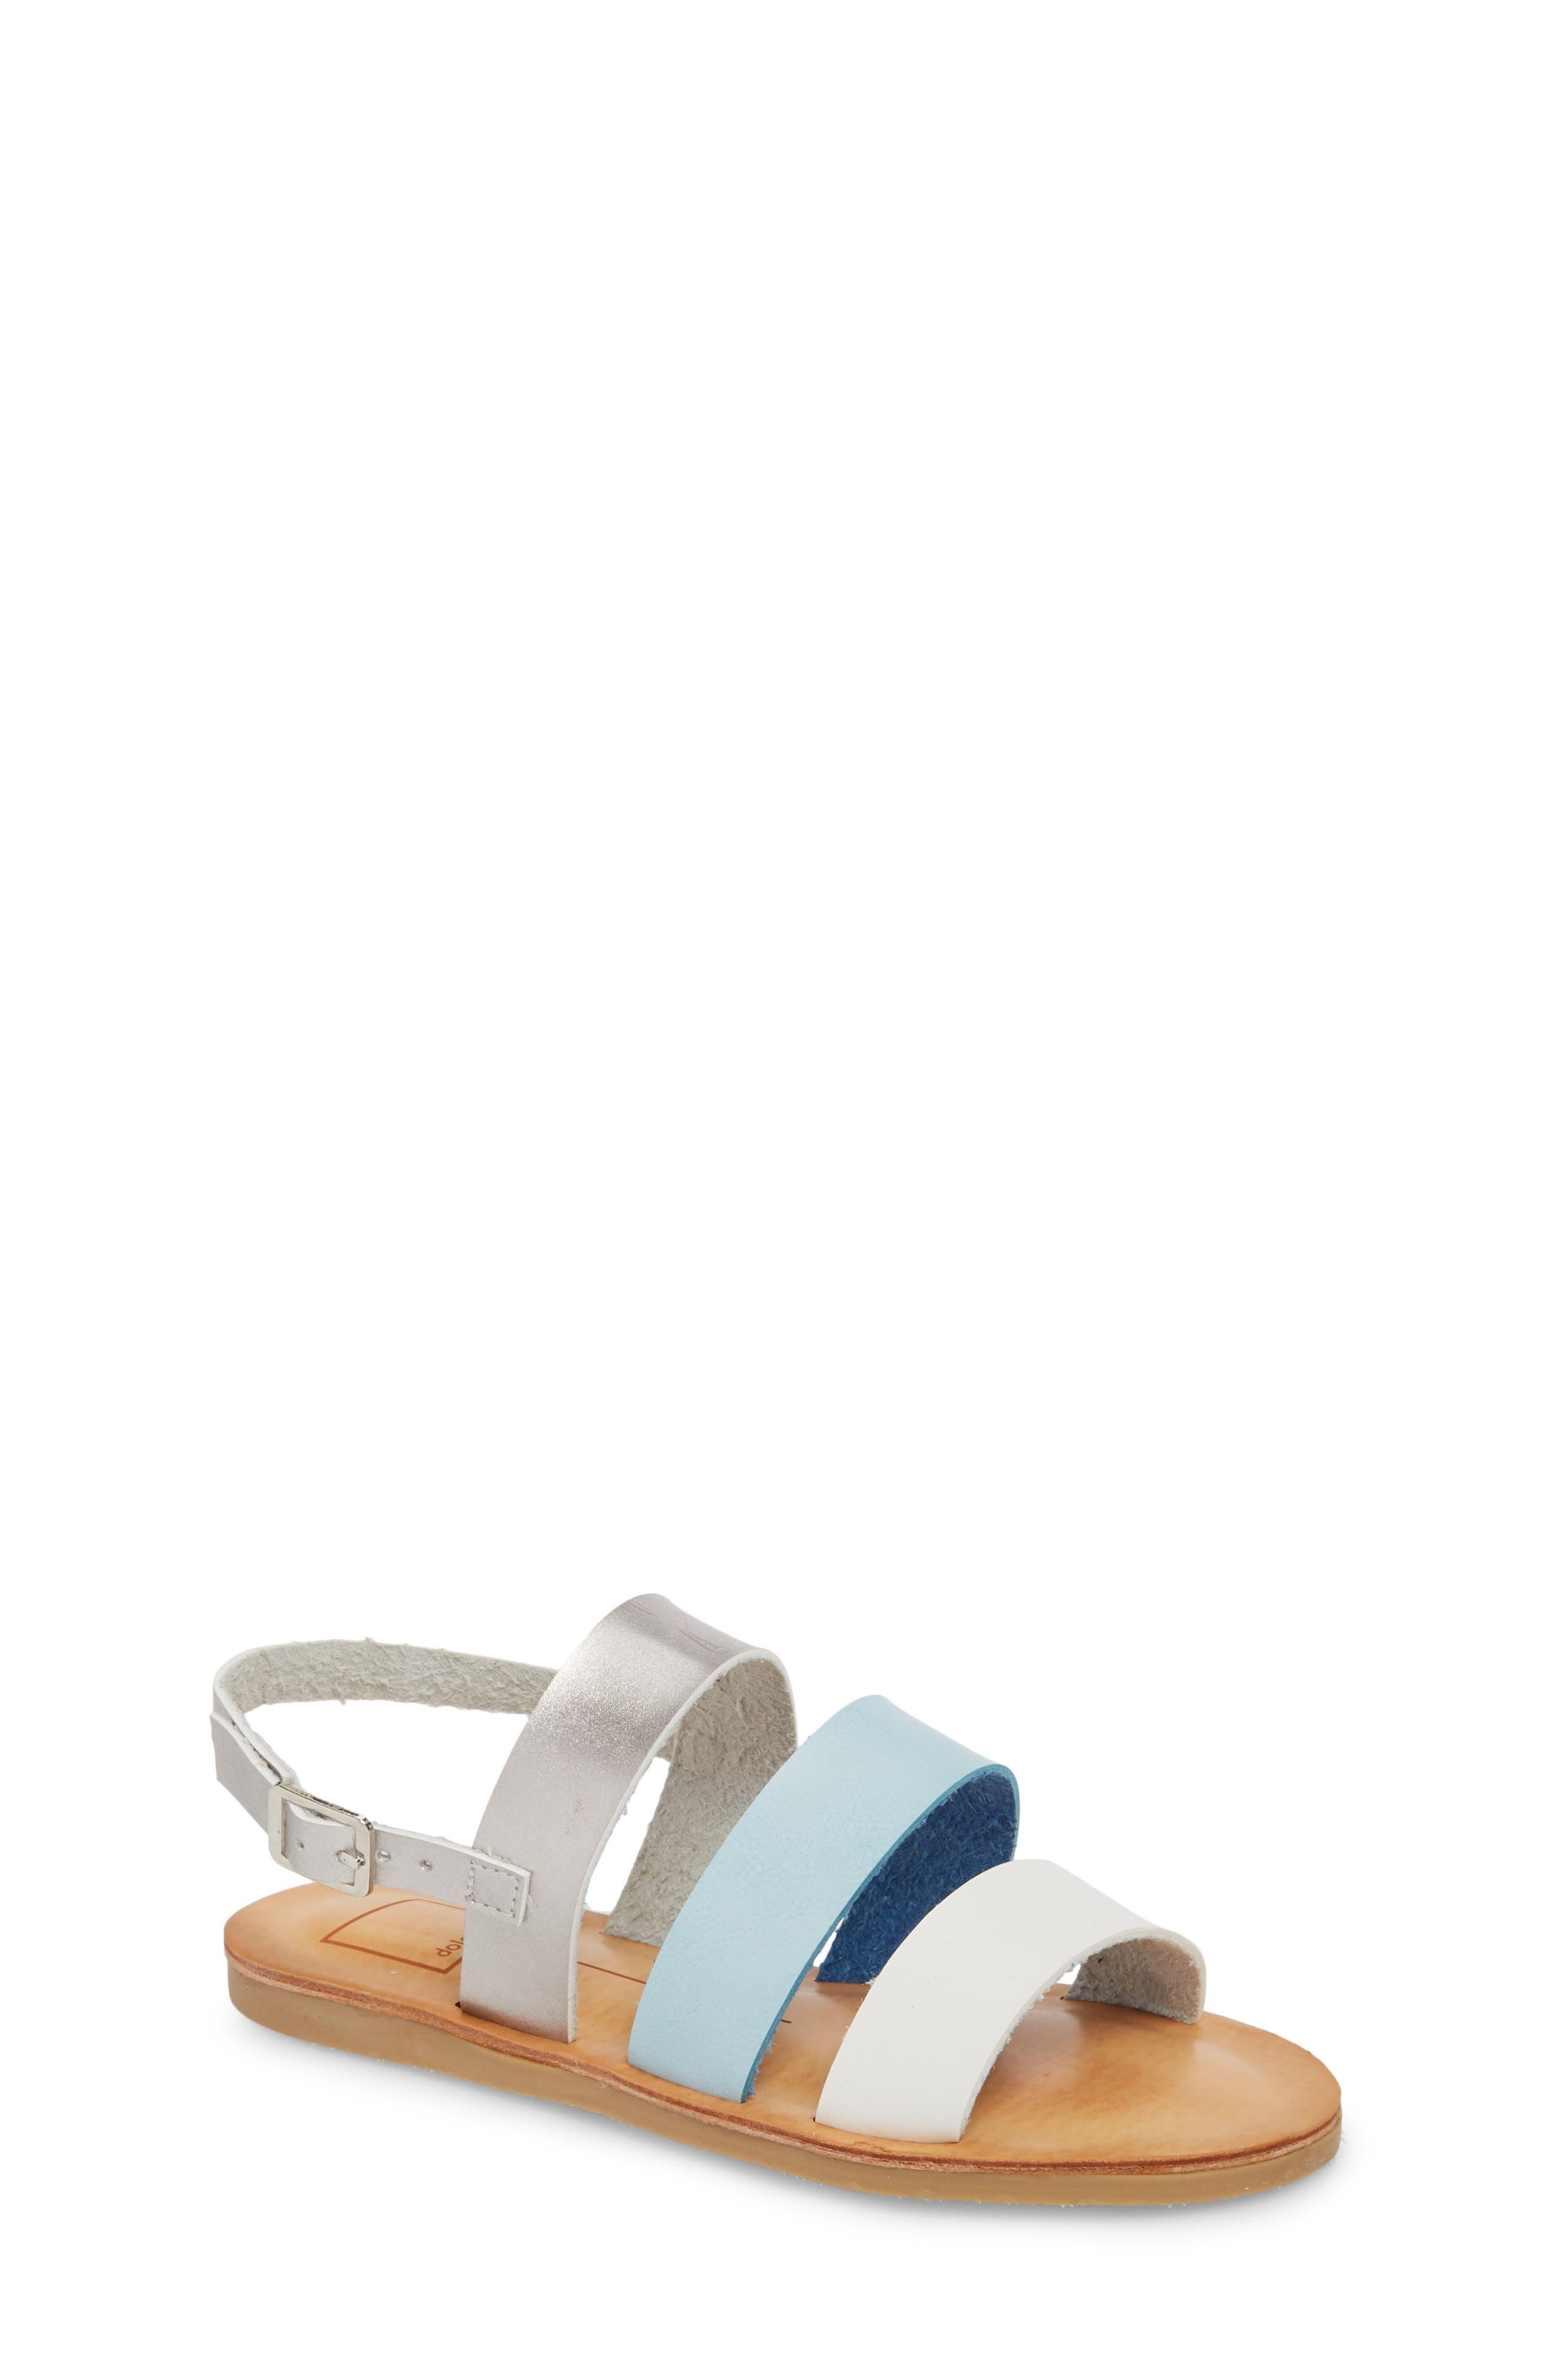 Joy Sandal,                         Main,                         color, Blue Multi